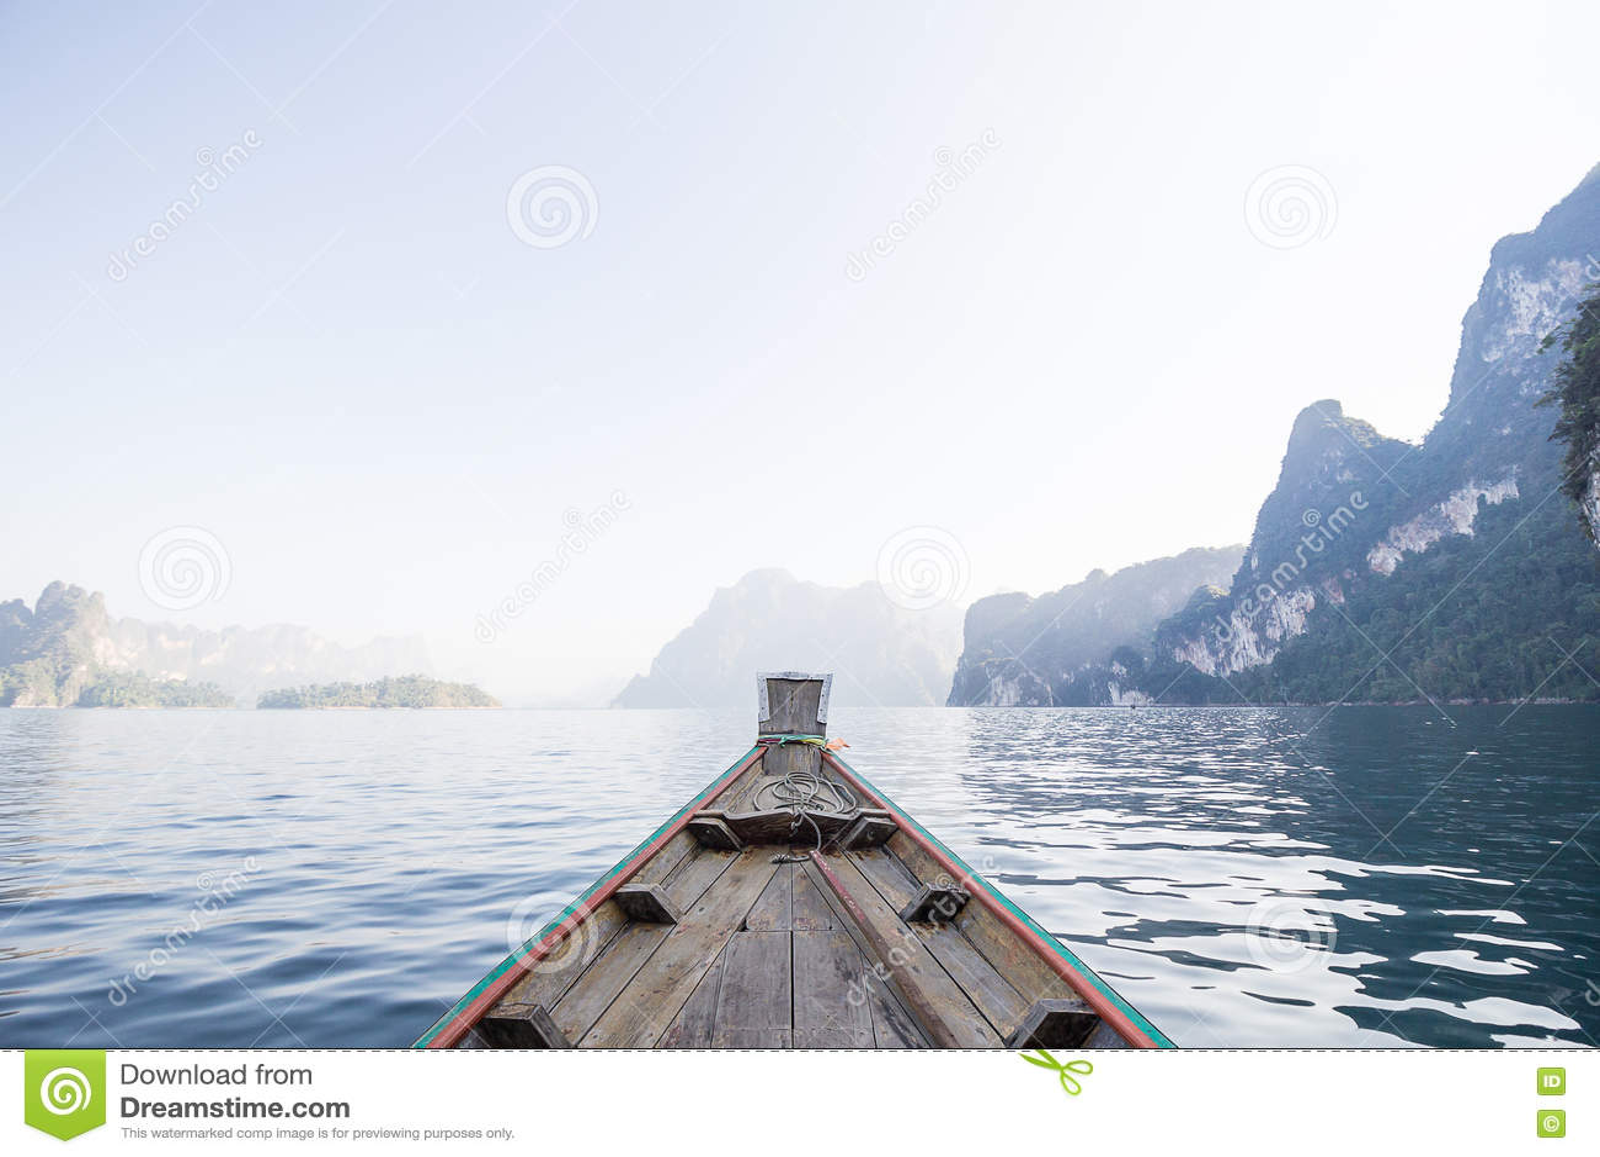 Front View Long Tail Boat At The Lake Stock Photo - Image ...